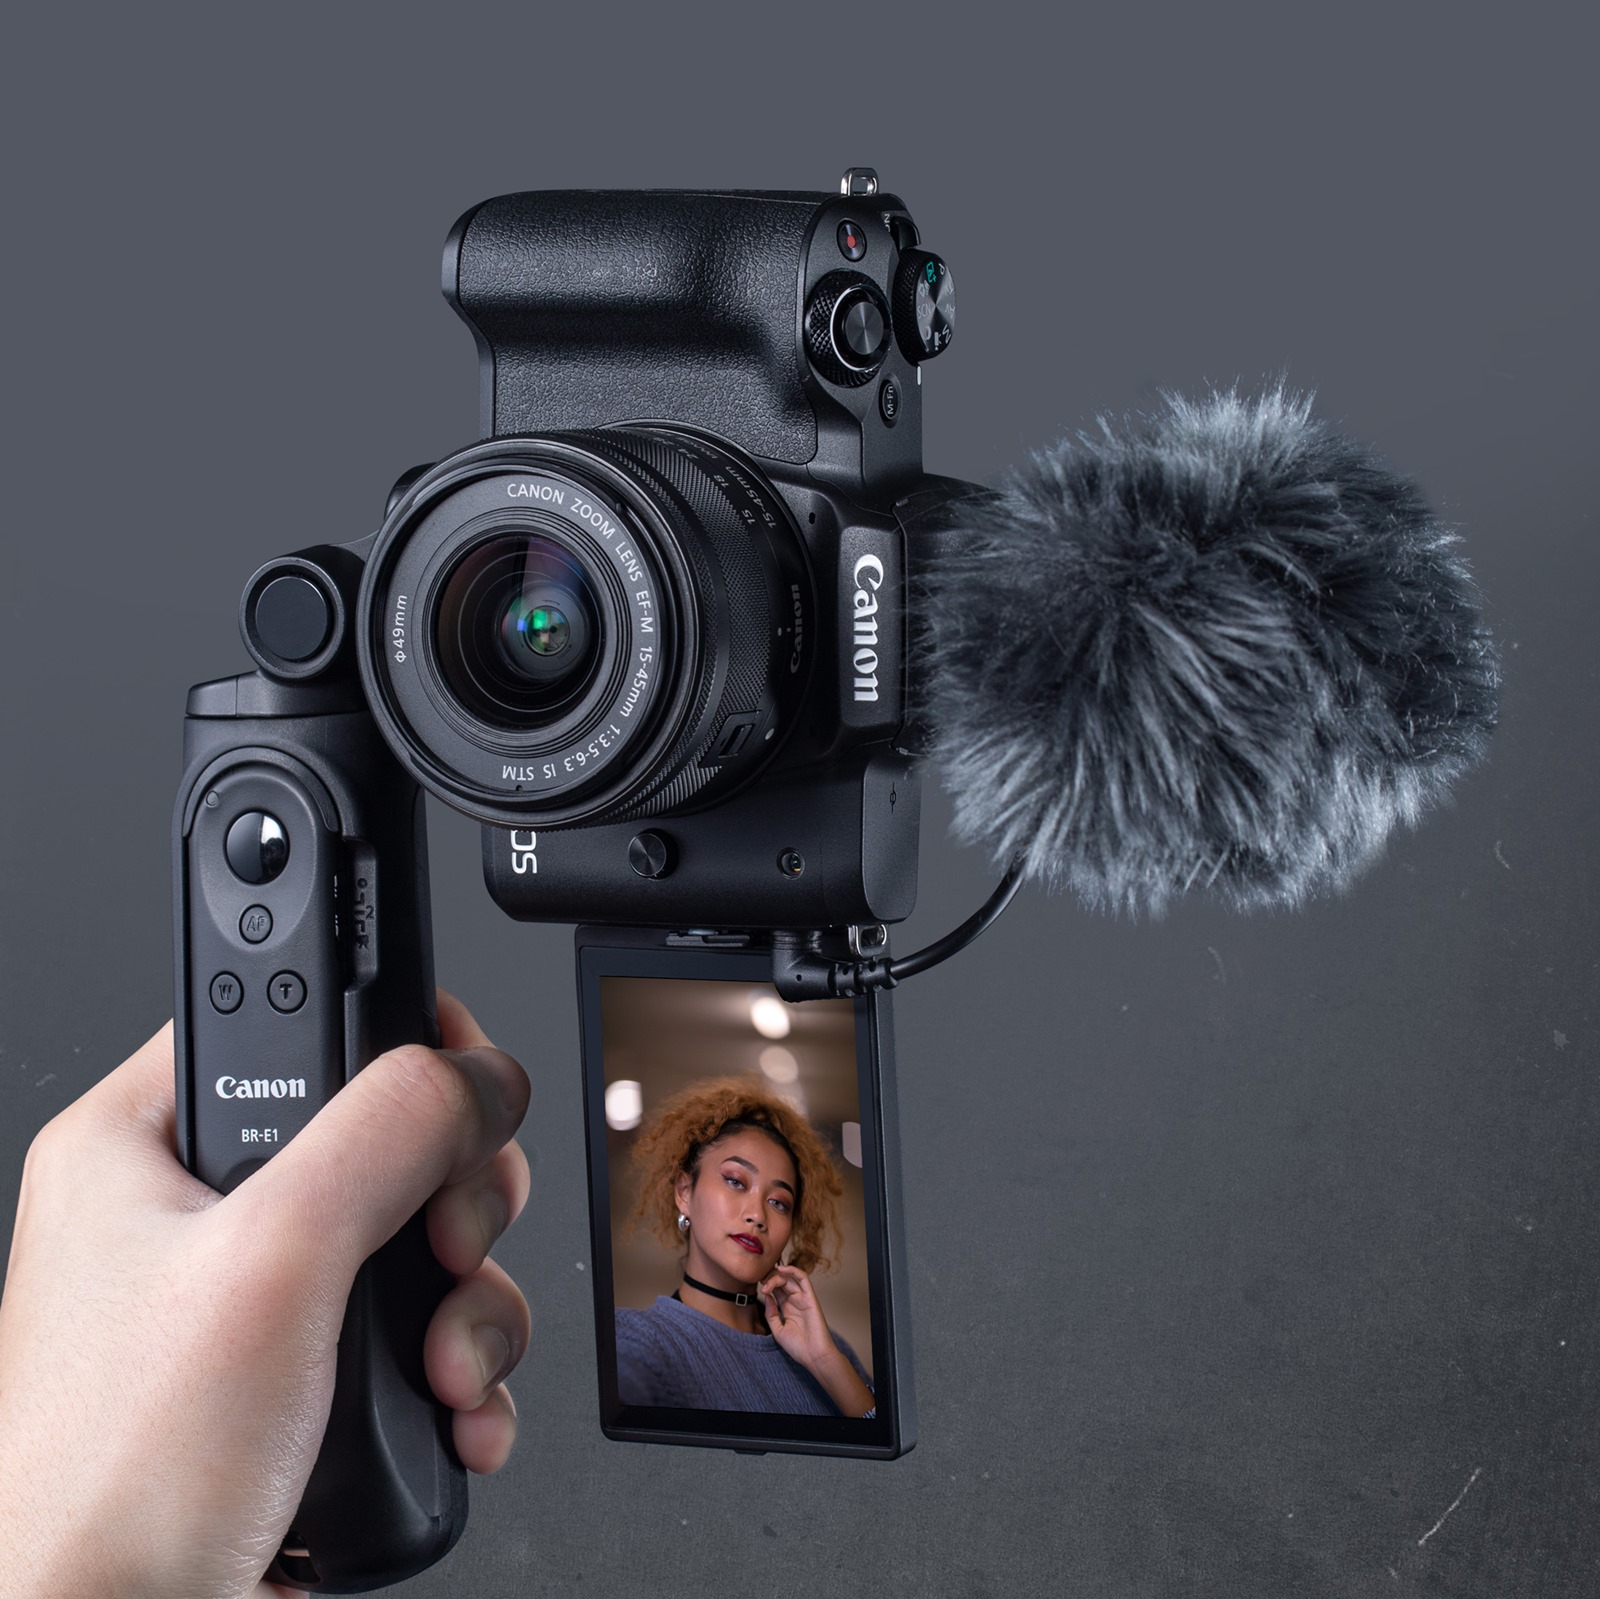 07-Canon-EOS-M50-Mark-II-支援-Wi-Fi-無線連接以及-YouTube-直播服務,能即時將影片從-EOS-M50-….jpg @3C 達人廖阿輝